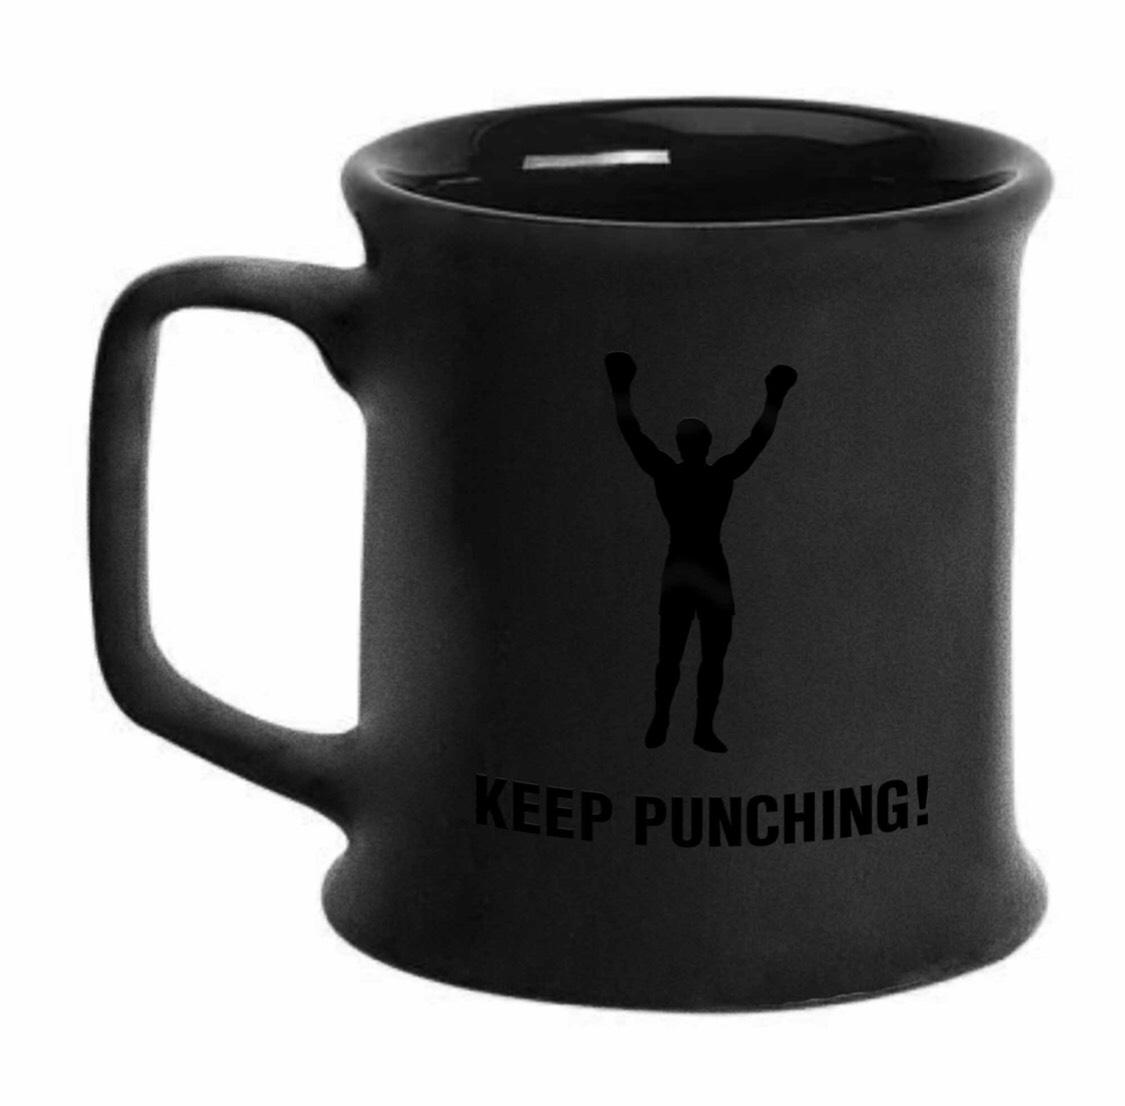 KEEP PUNCHING! Coffee Mug